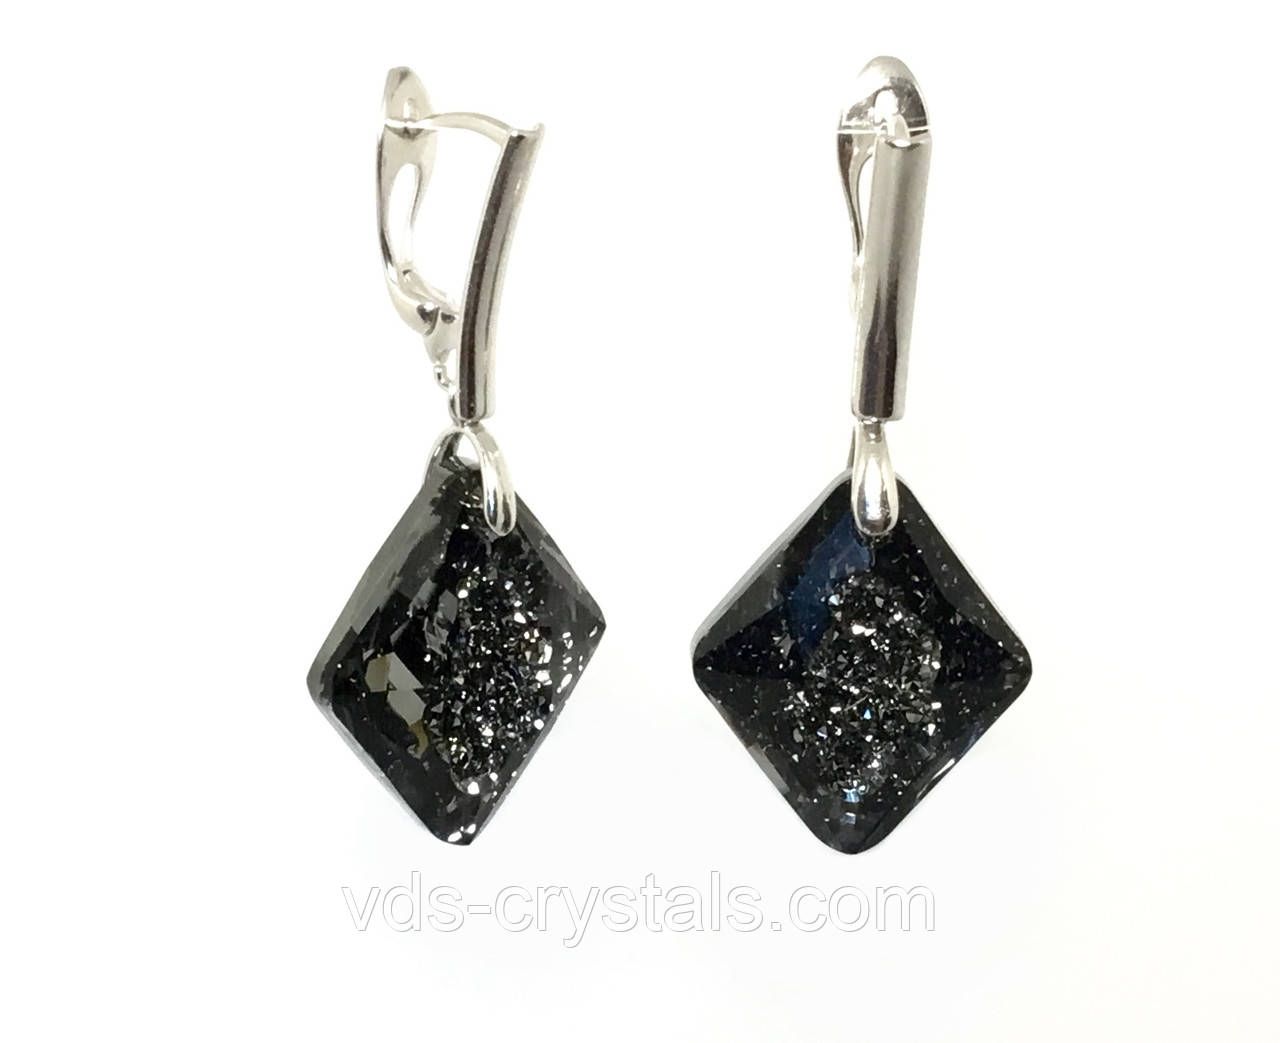 Серебряные серьги Swarovski Растущий кристалл 6926 Crystal Silver Night